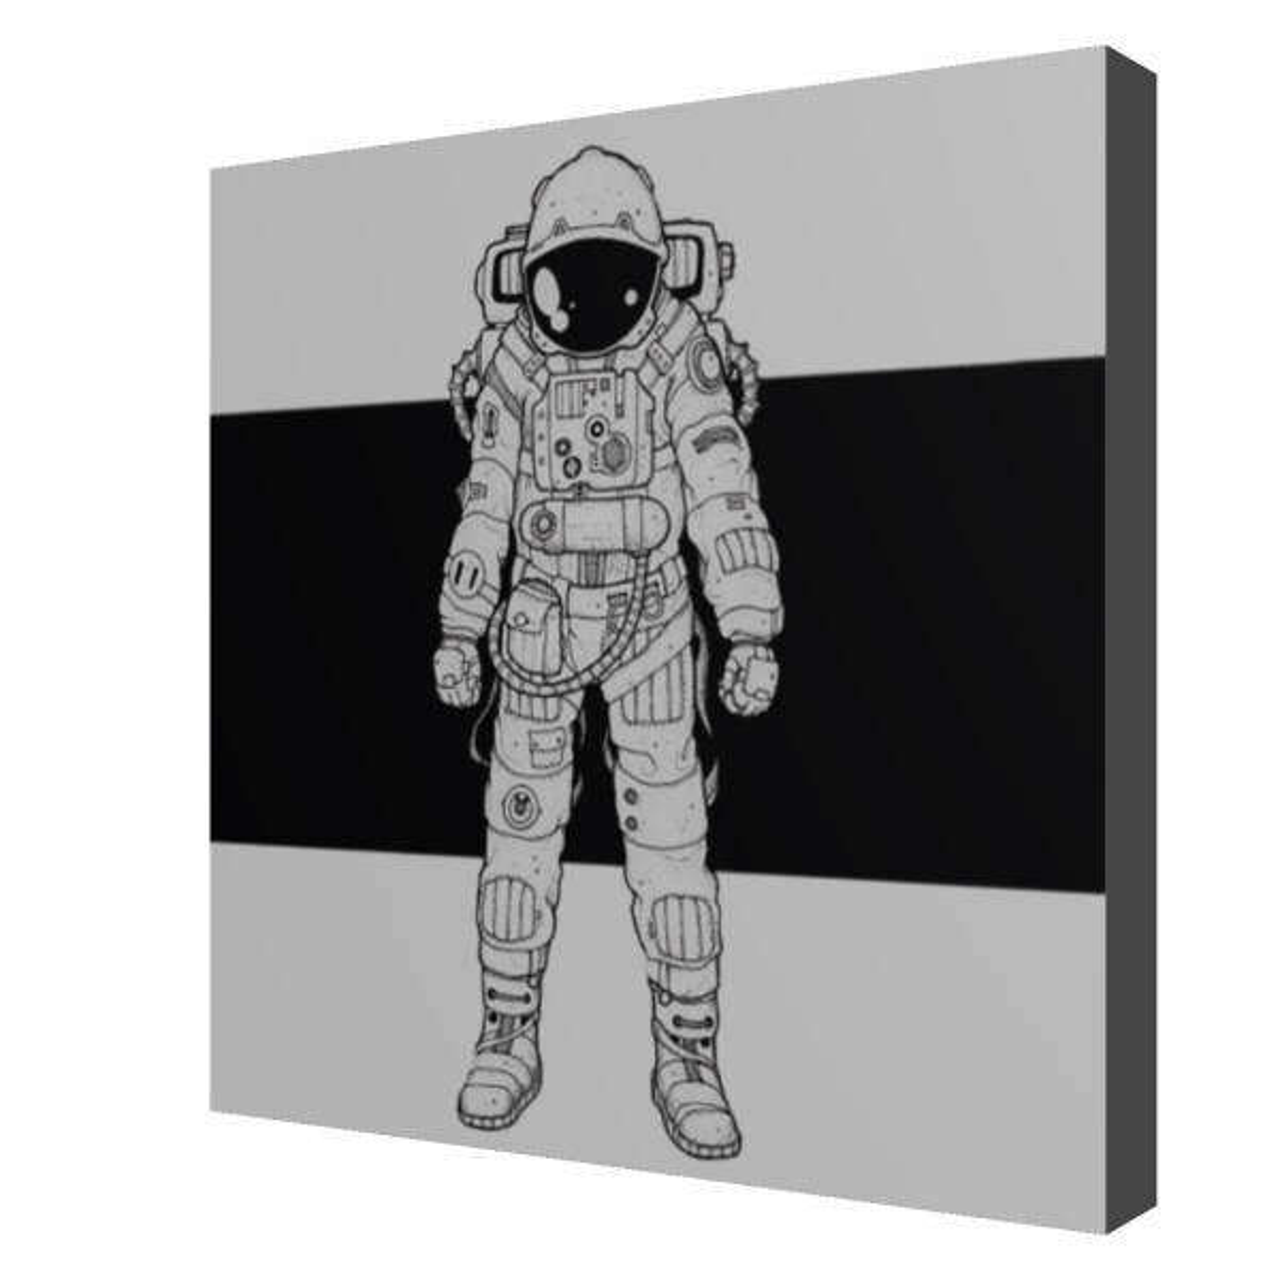 پیکسل طرح فضانورد کد 11